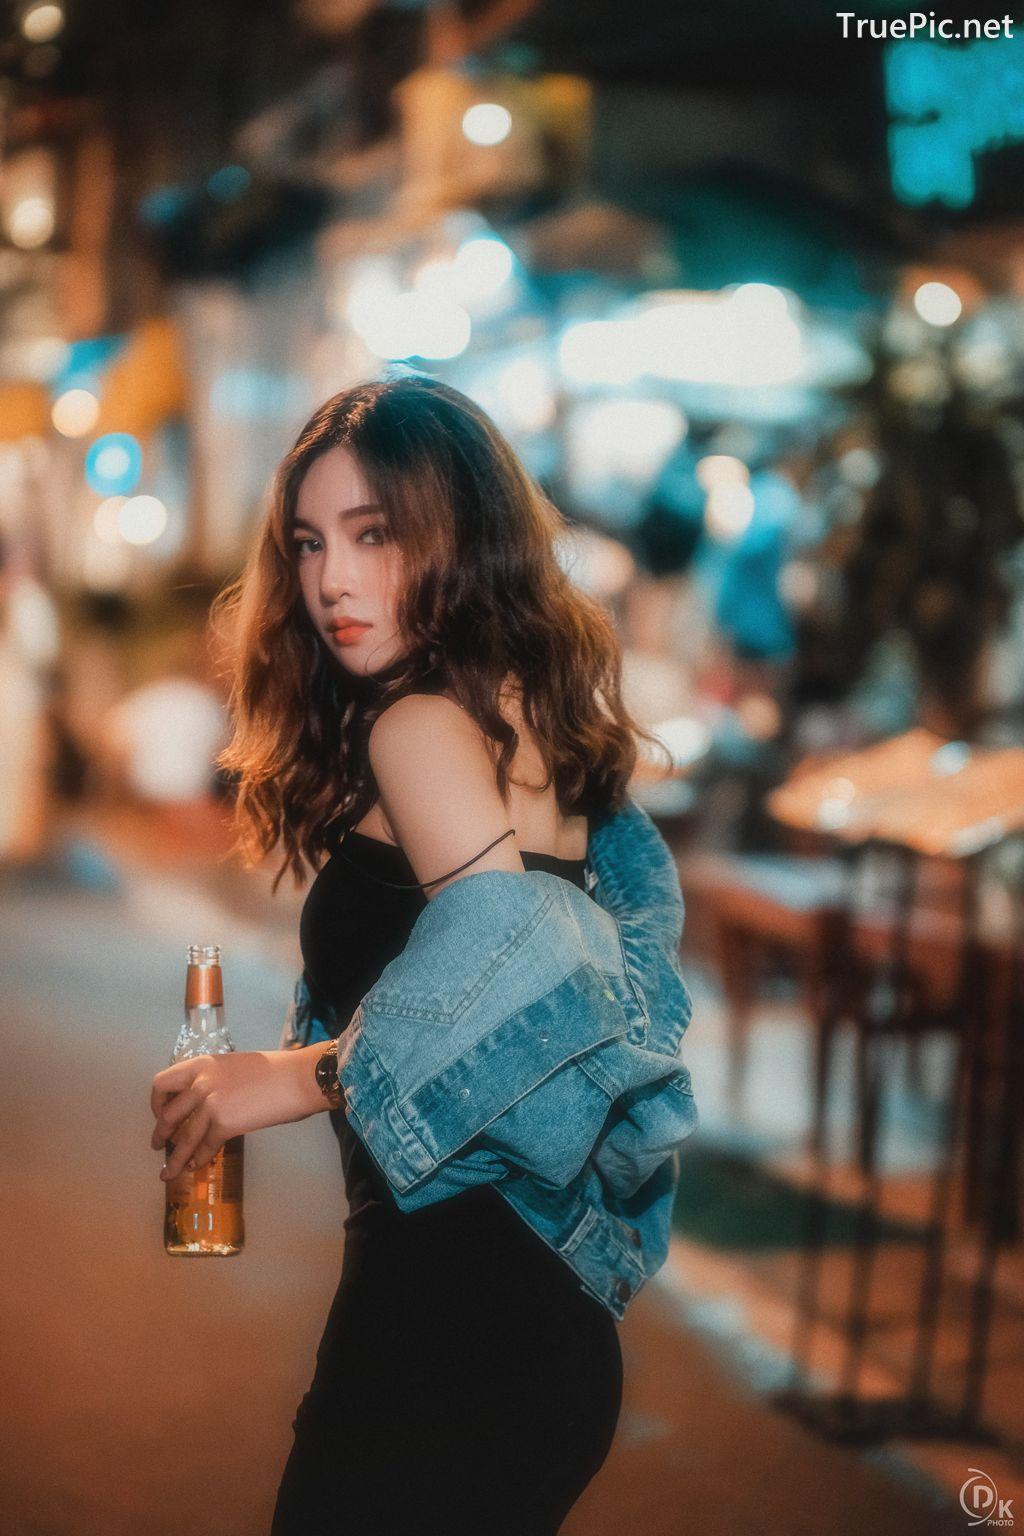 Image Vietnamese Model - Let's Get Drunk Tonight - TruePic.net - Picture-6